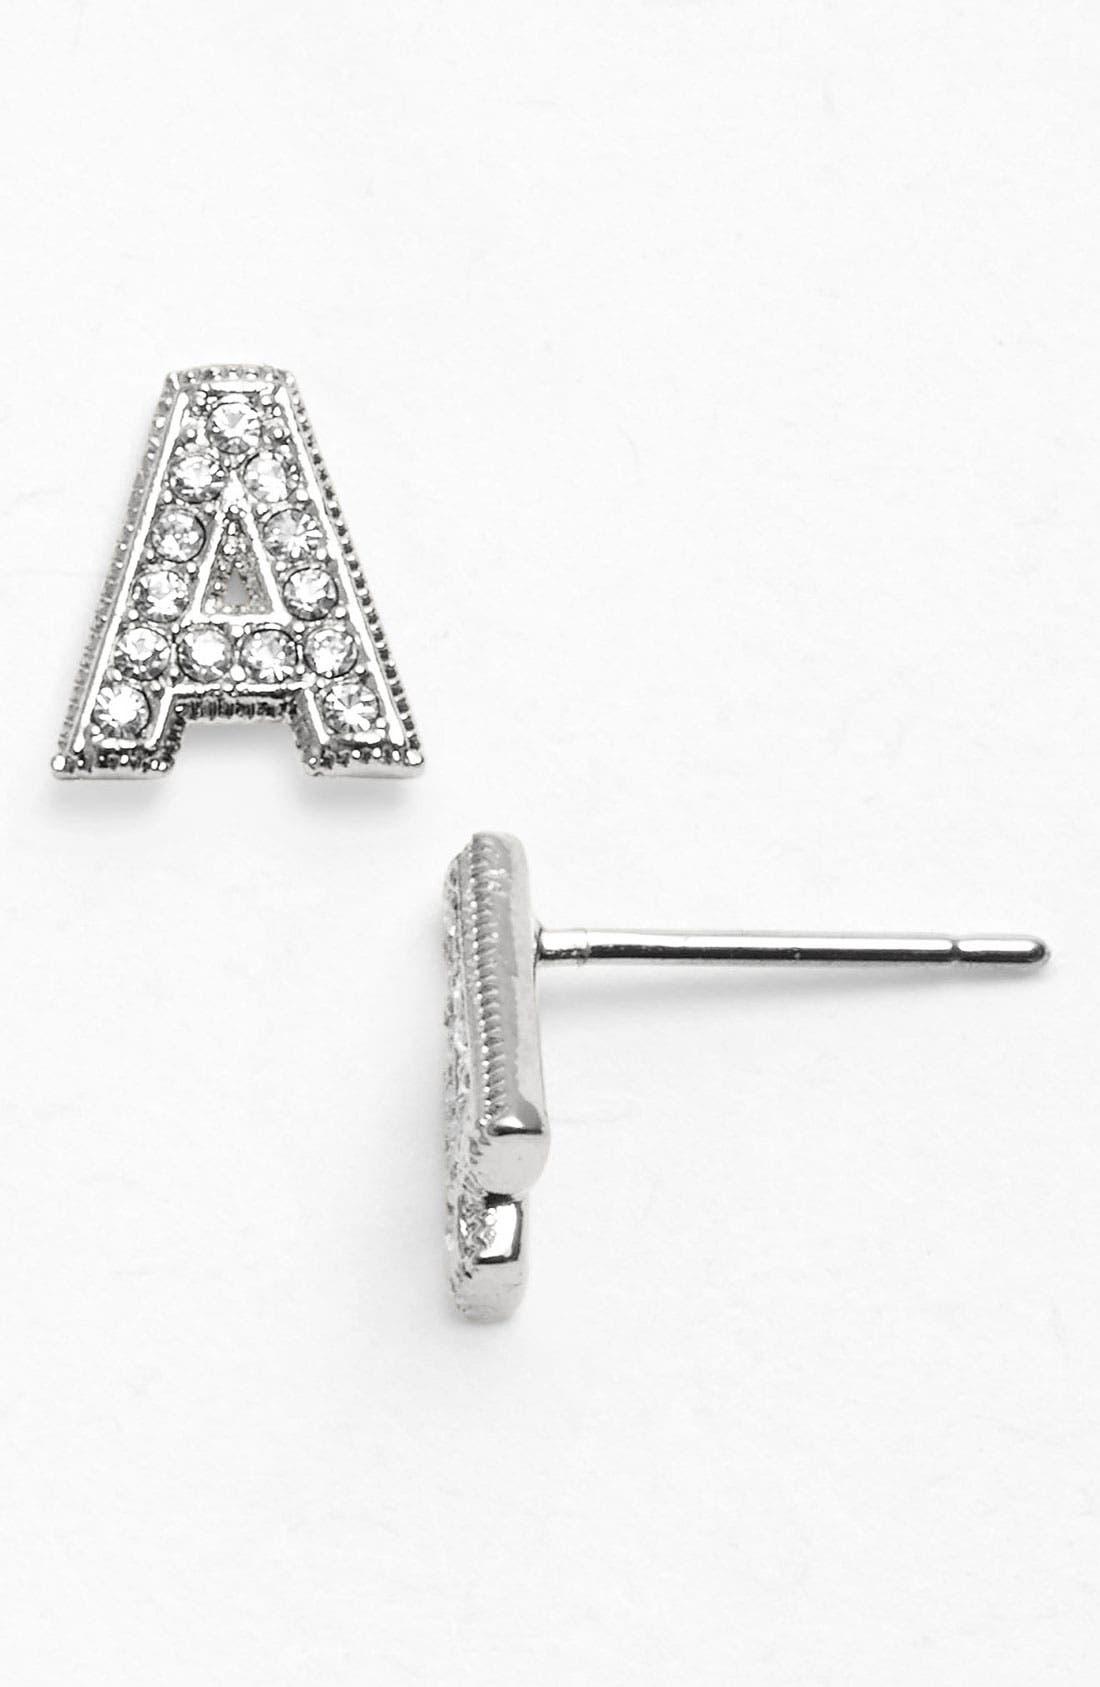 Main Image - Nadri 'Novelty' Initial Stud Earrings (Nordstrom Exclusive)